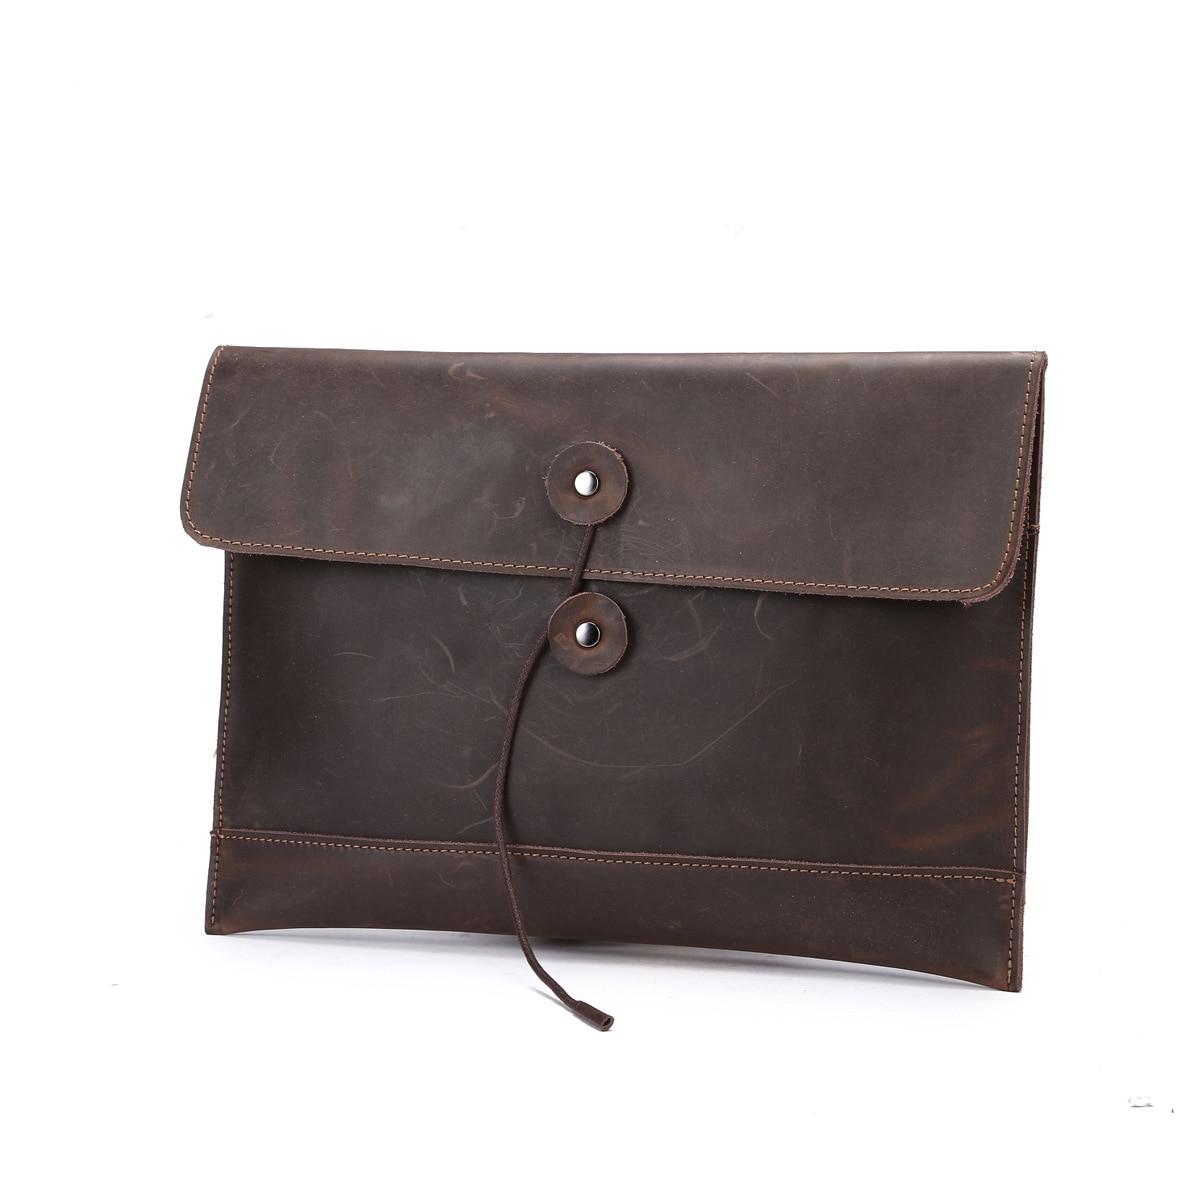 ФОТО Genuine Leather Shoulder Bag New Men'S Crossbody Bag Leisure Men Messenger Bag Student Leisure